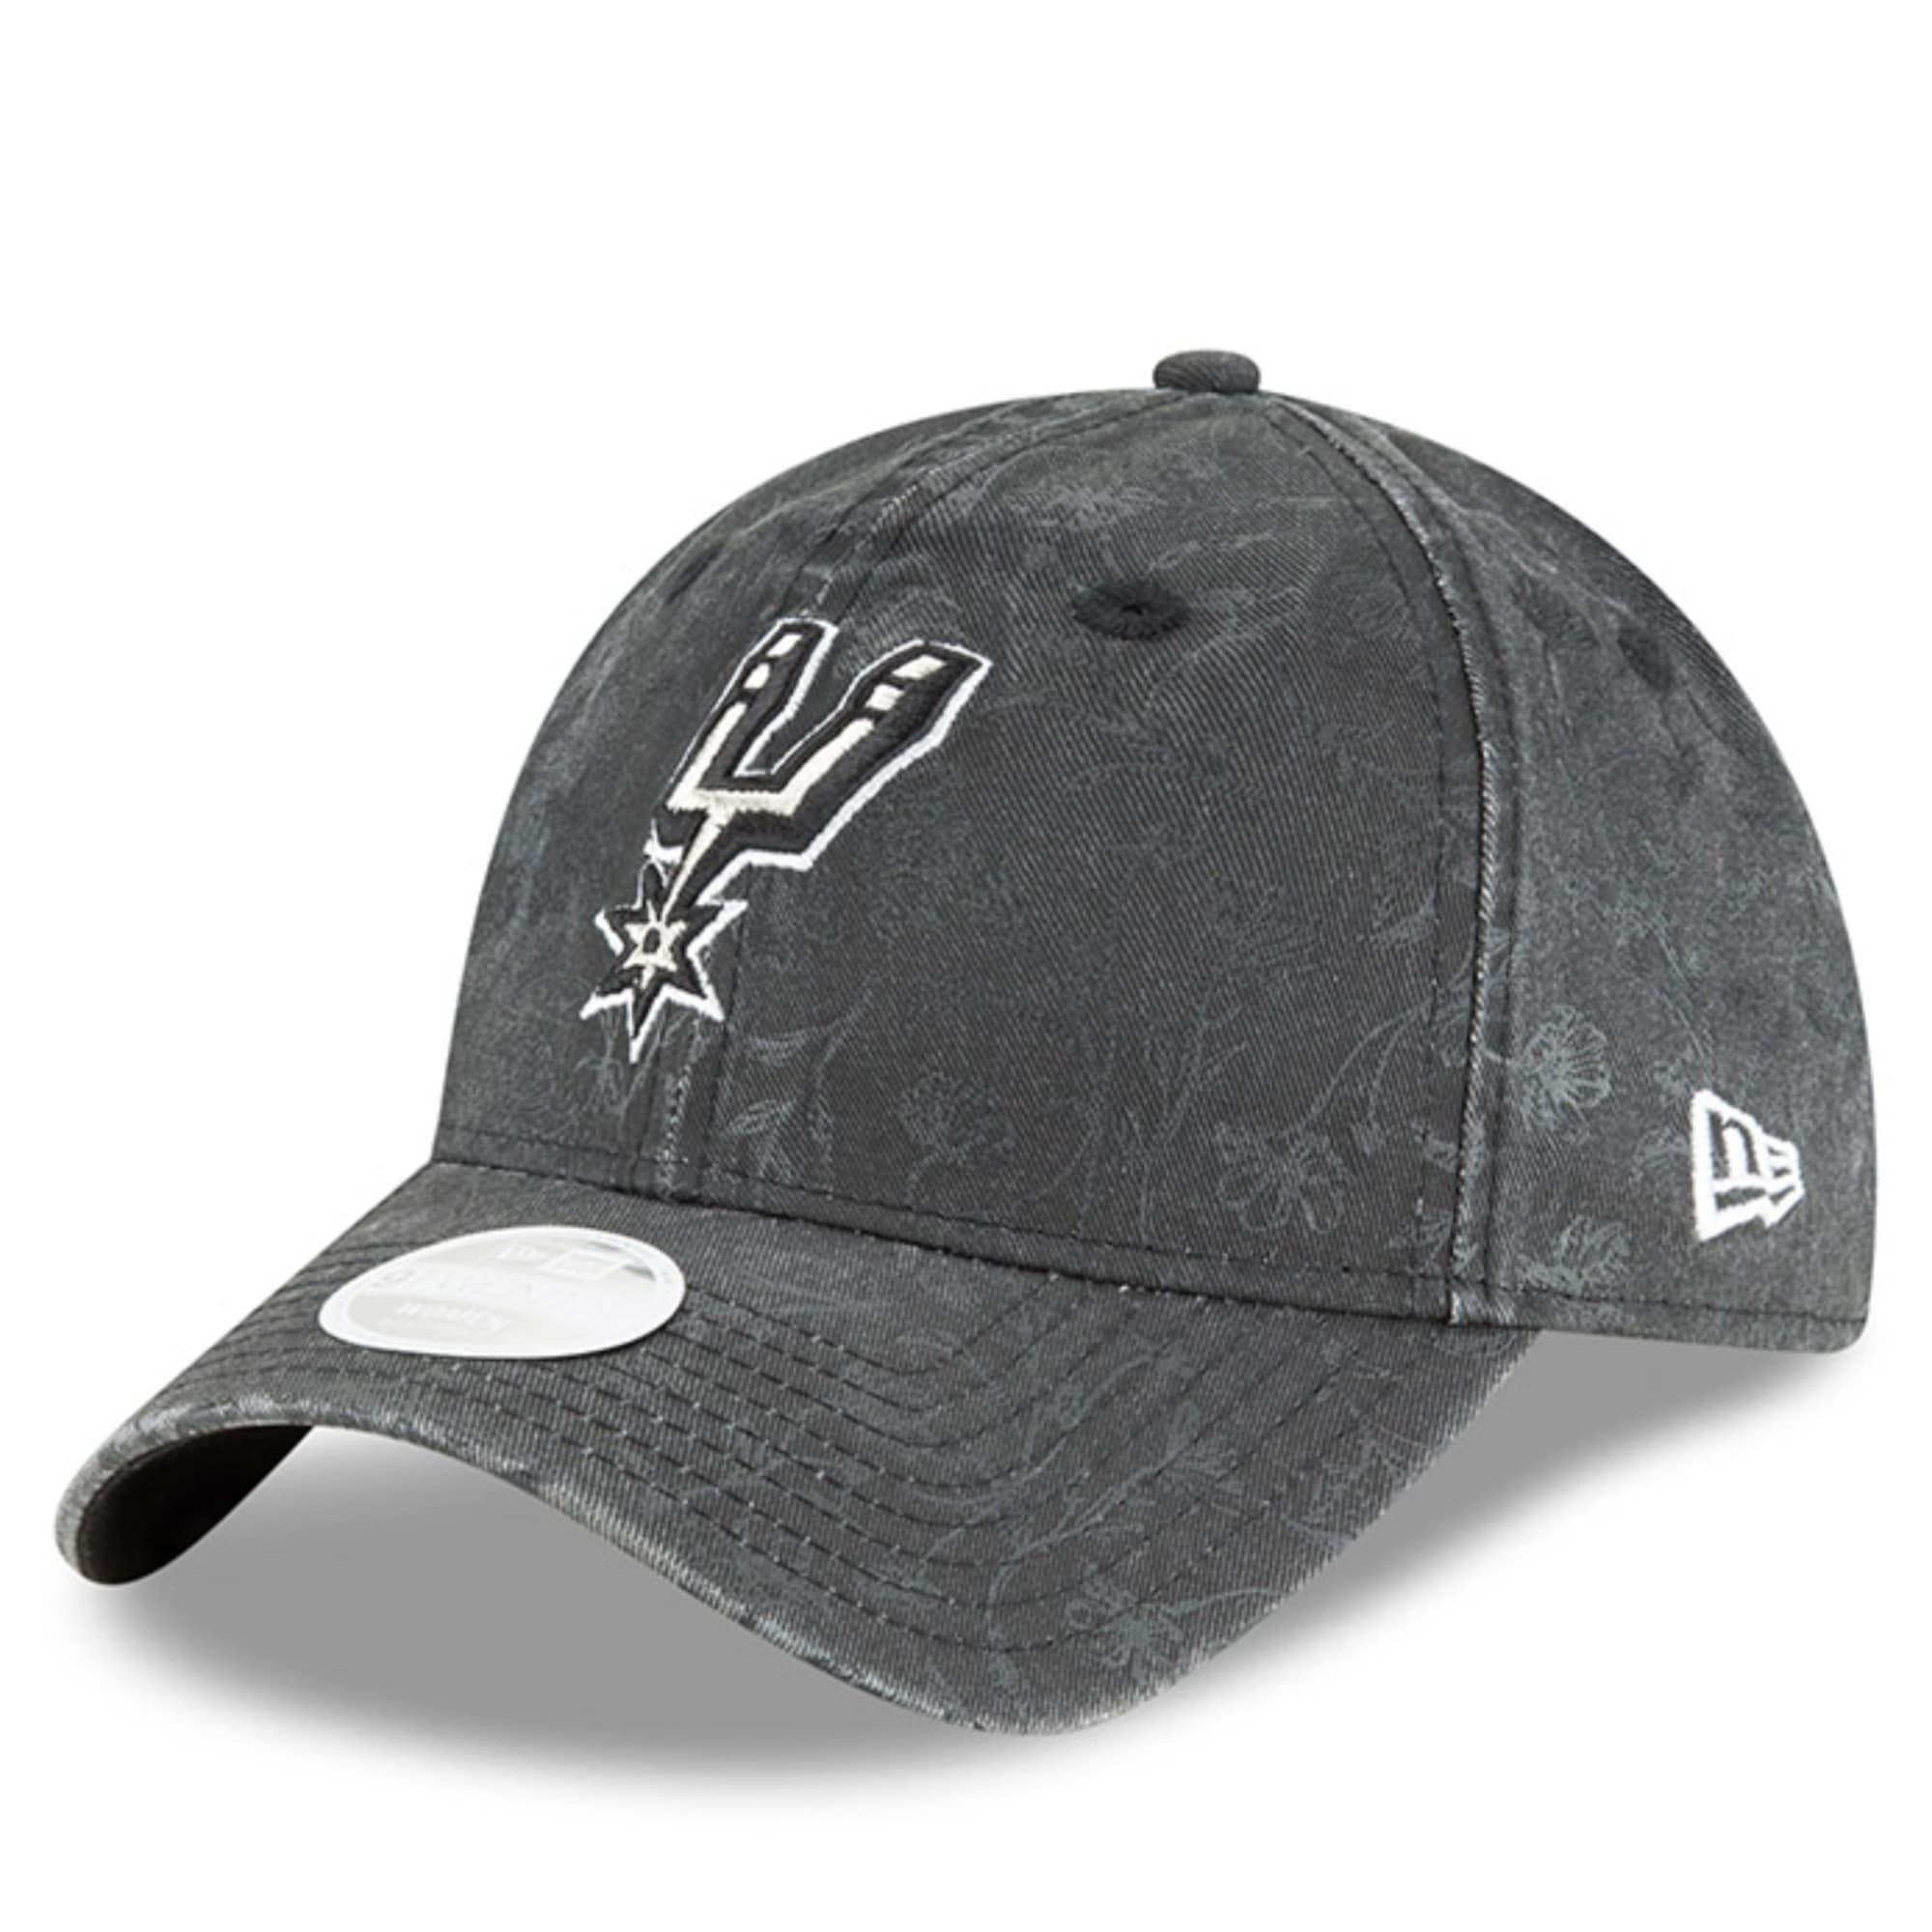 San Antonio Spurs New Era Women's Floral Peek 9TWENTY Adjustable Hat - Black